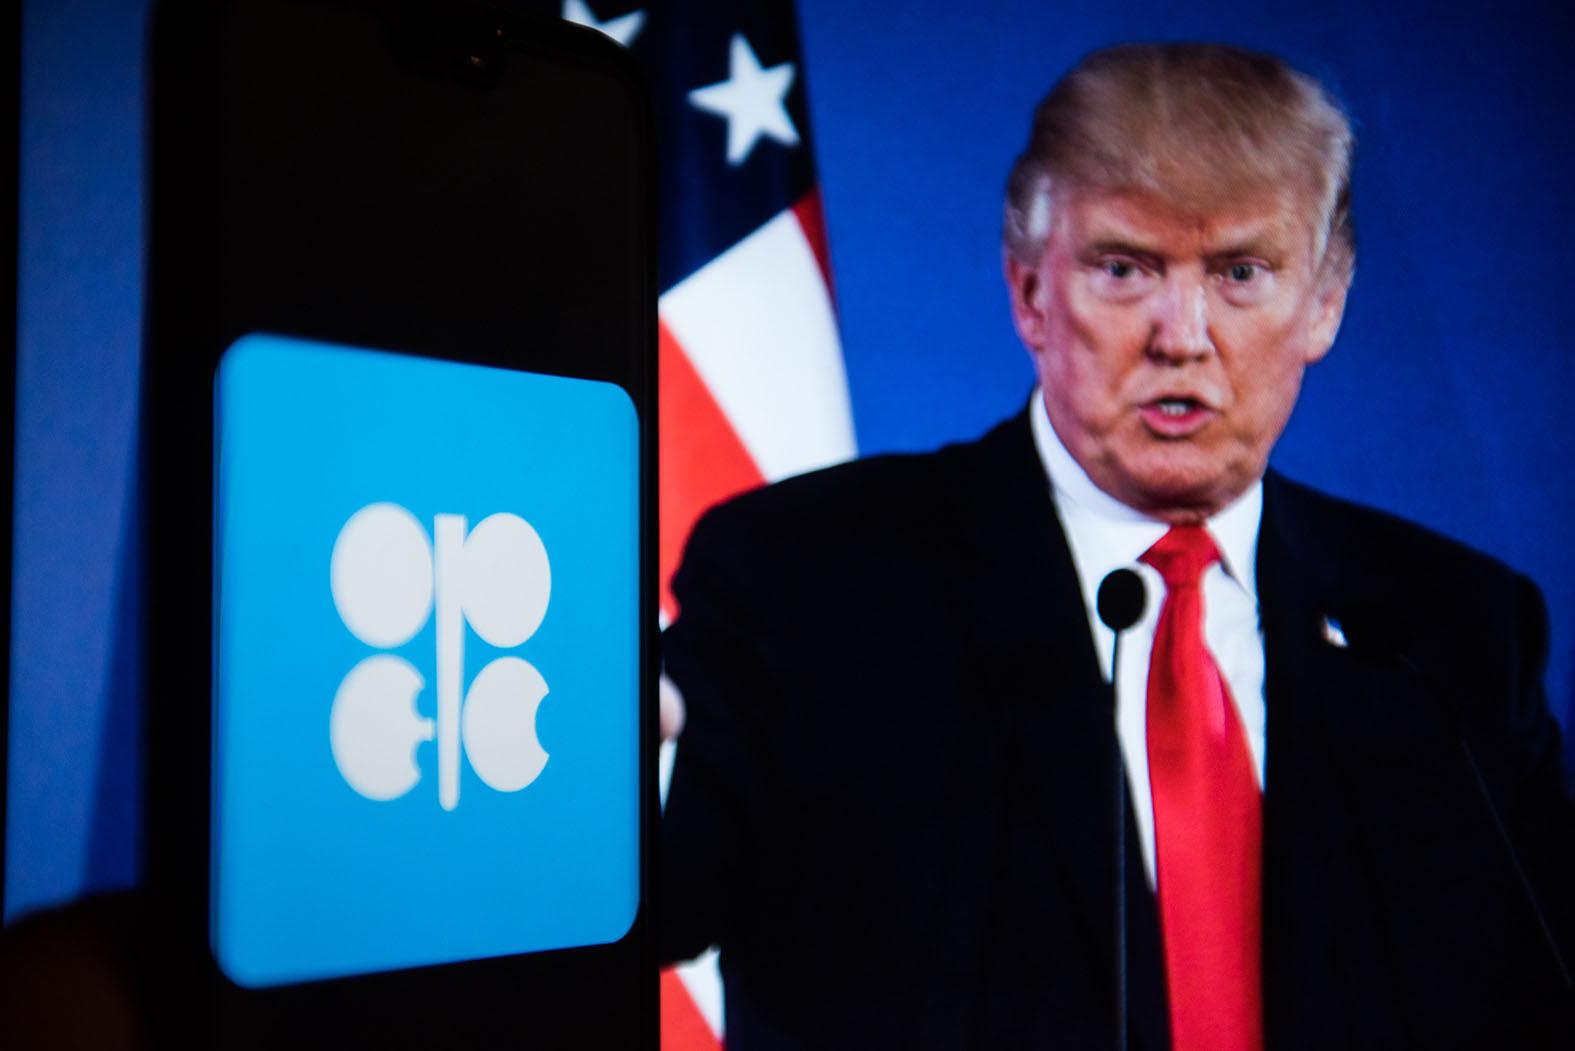 Спасение от нефтяного апокалипсиса: Путин переиграл Трампа и саудитов